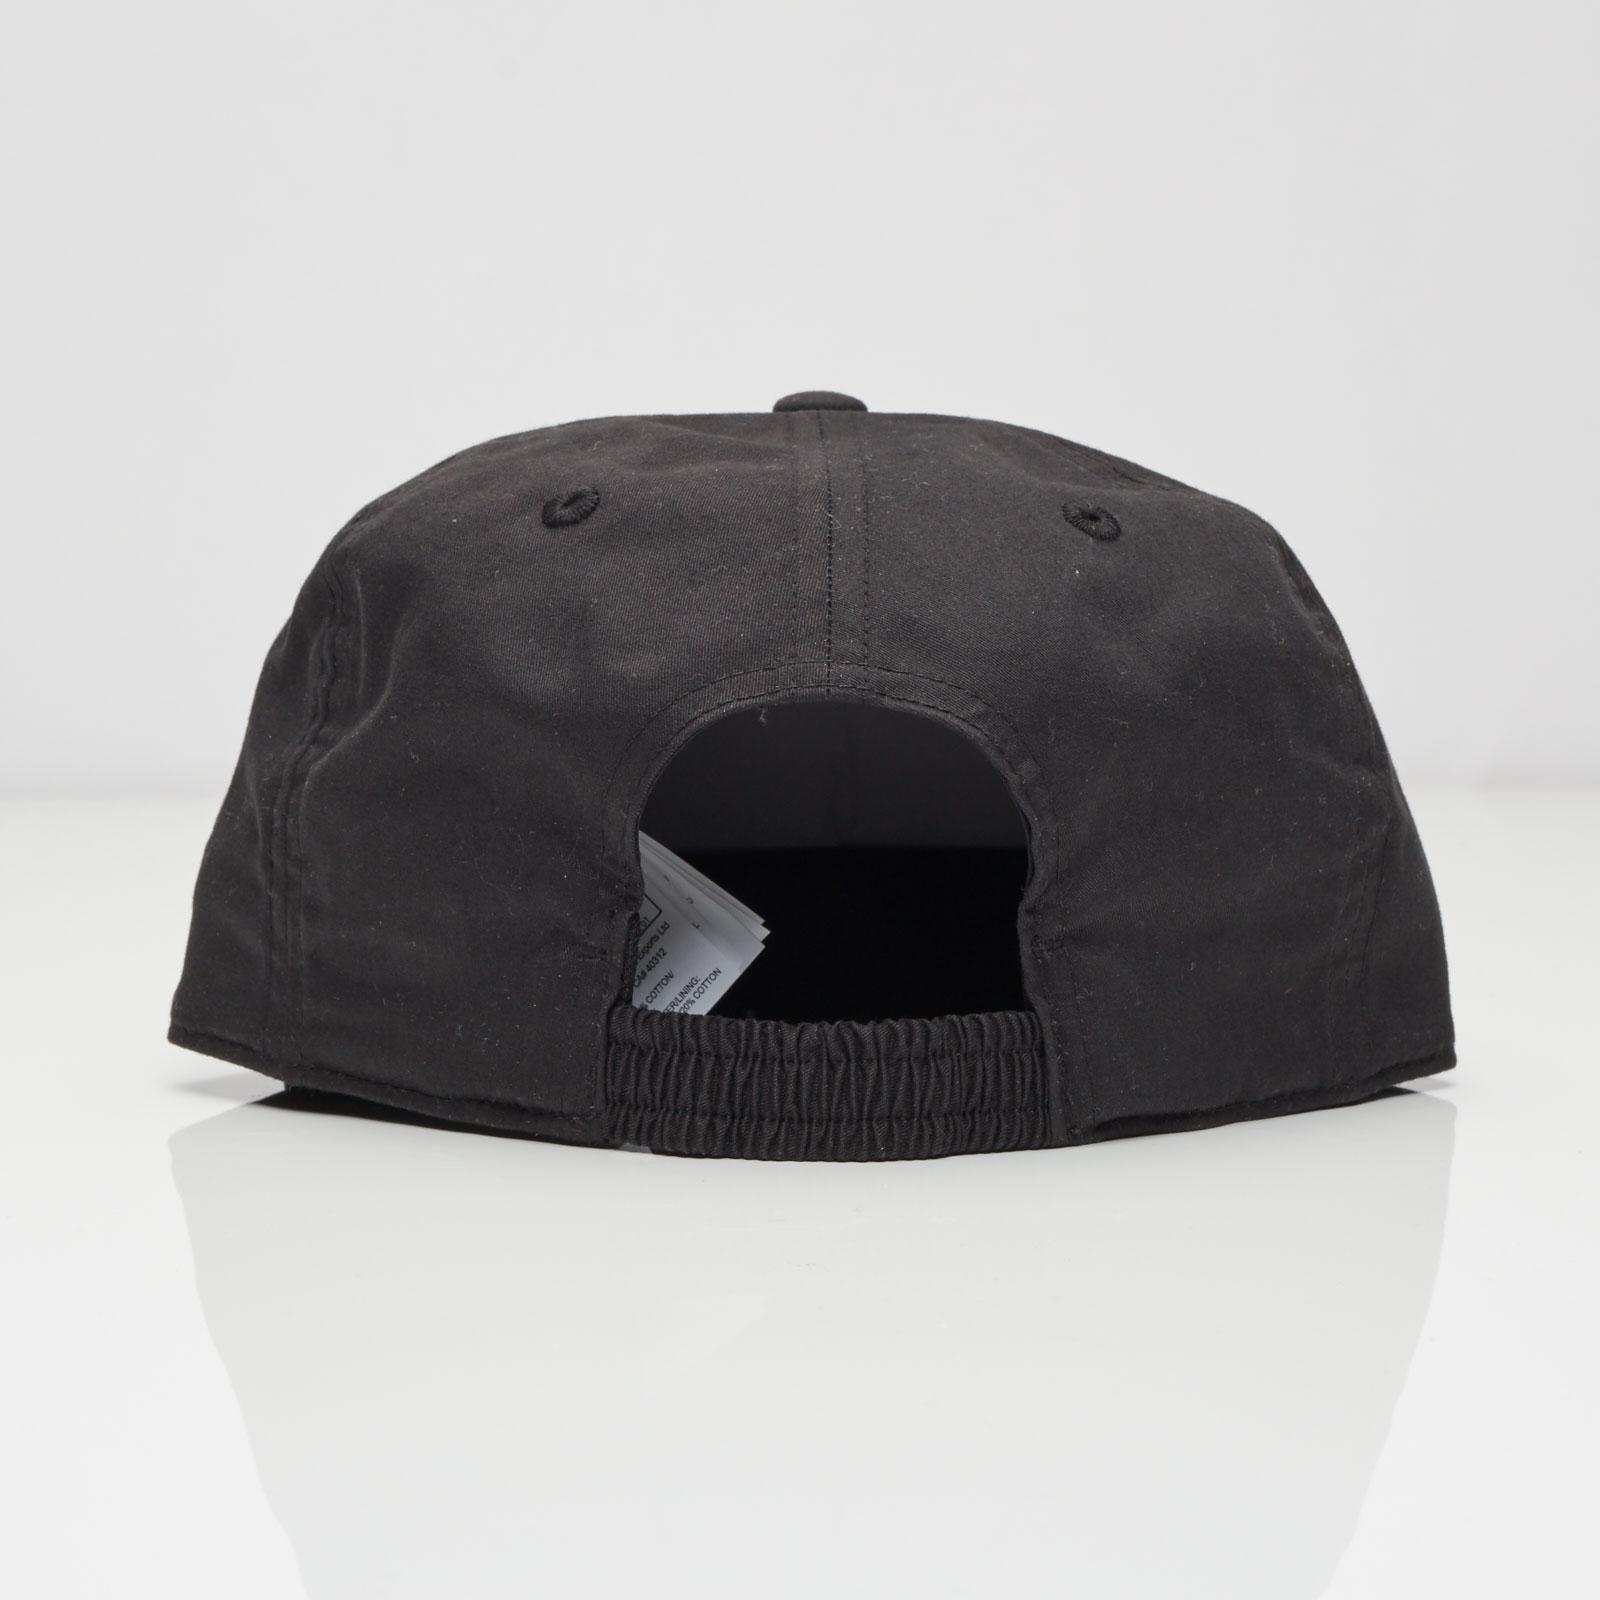 eb5059d4 adidas Re Eqt Cap - Ay9420 - Sneakersnstuff | sneakers & streetwear ...